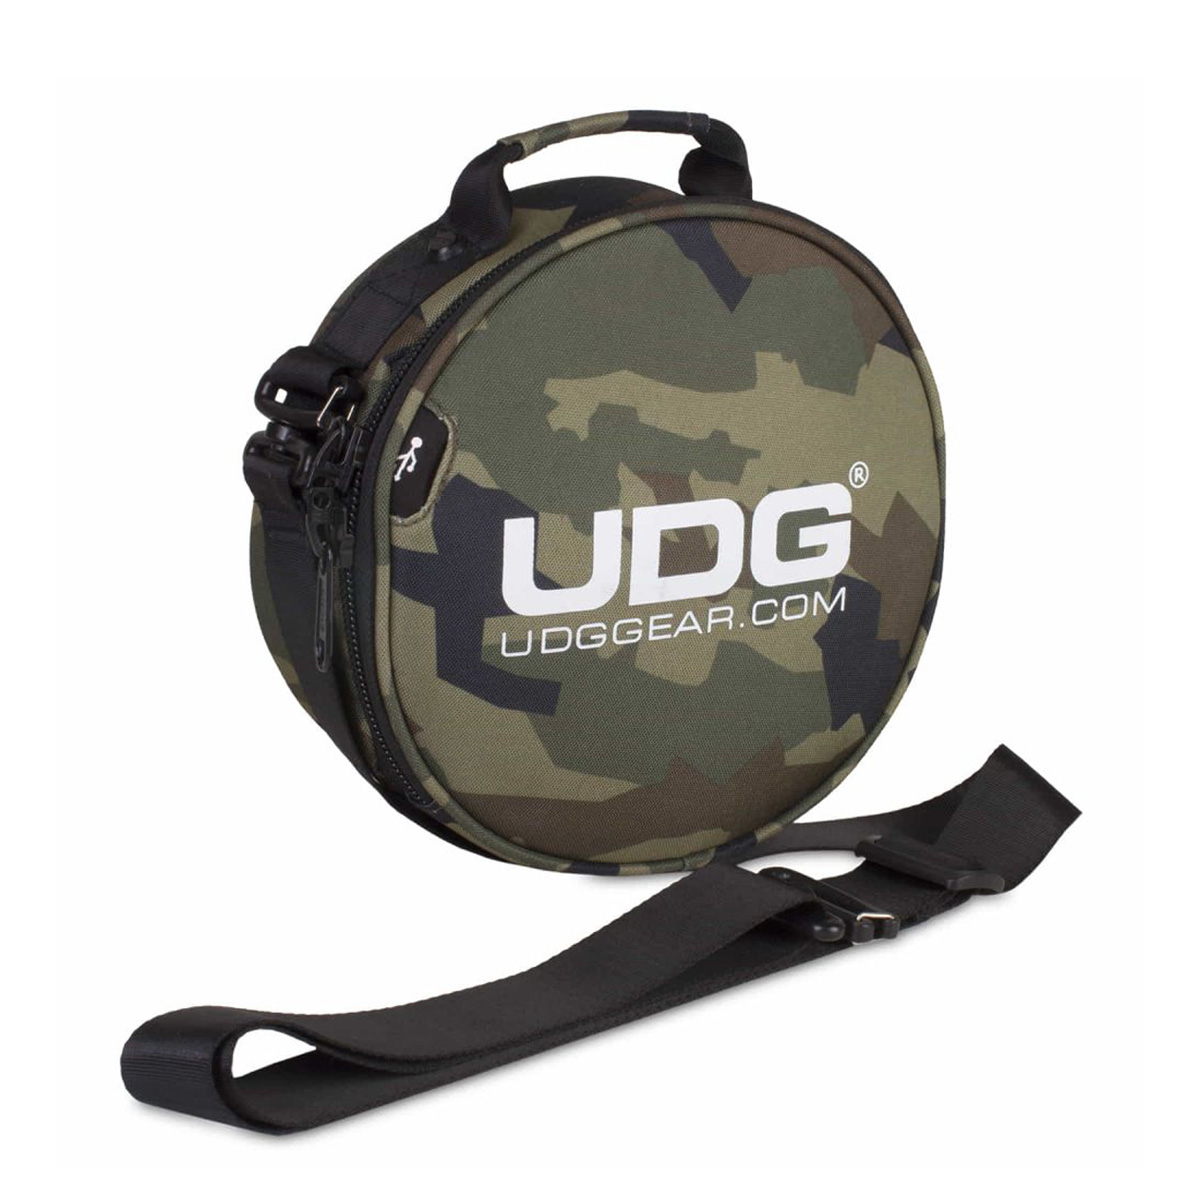 Bag para Fone de Ouvido Ultimate DIGI UDG U9950BC/OR